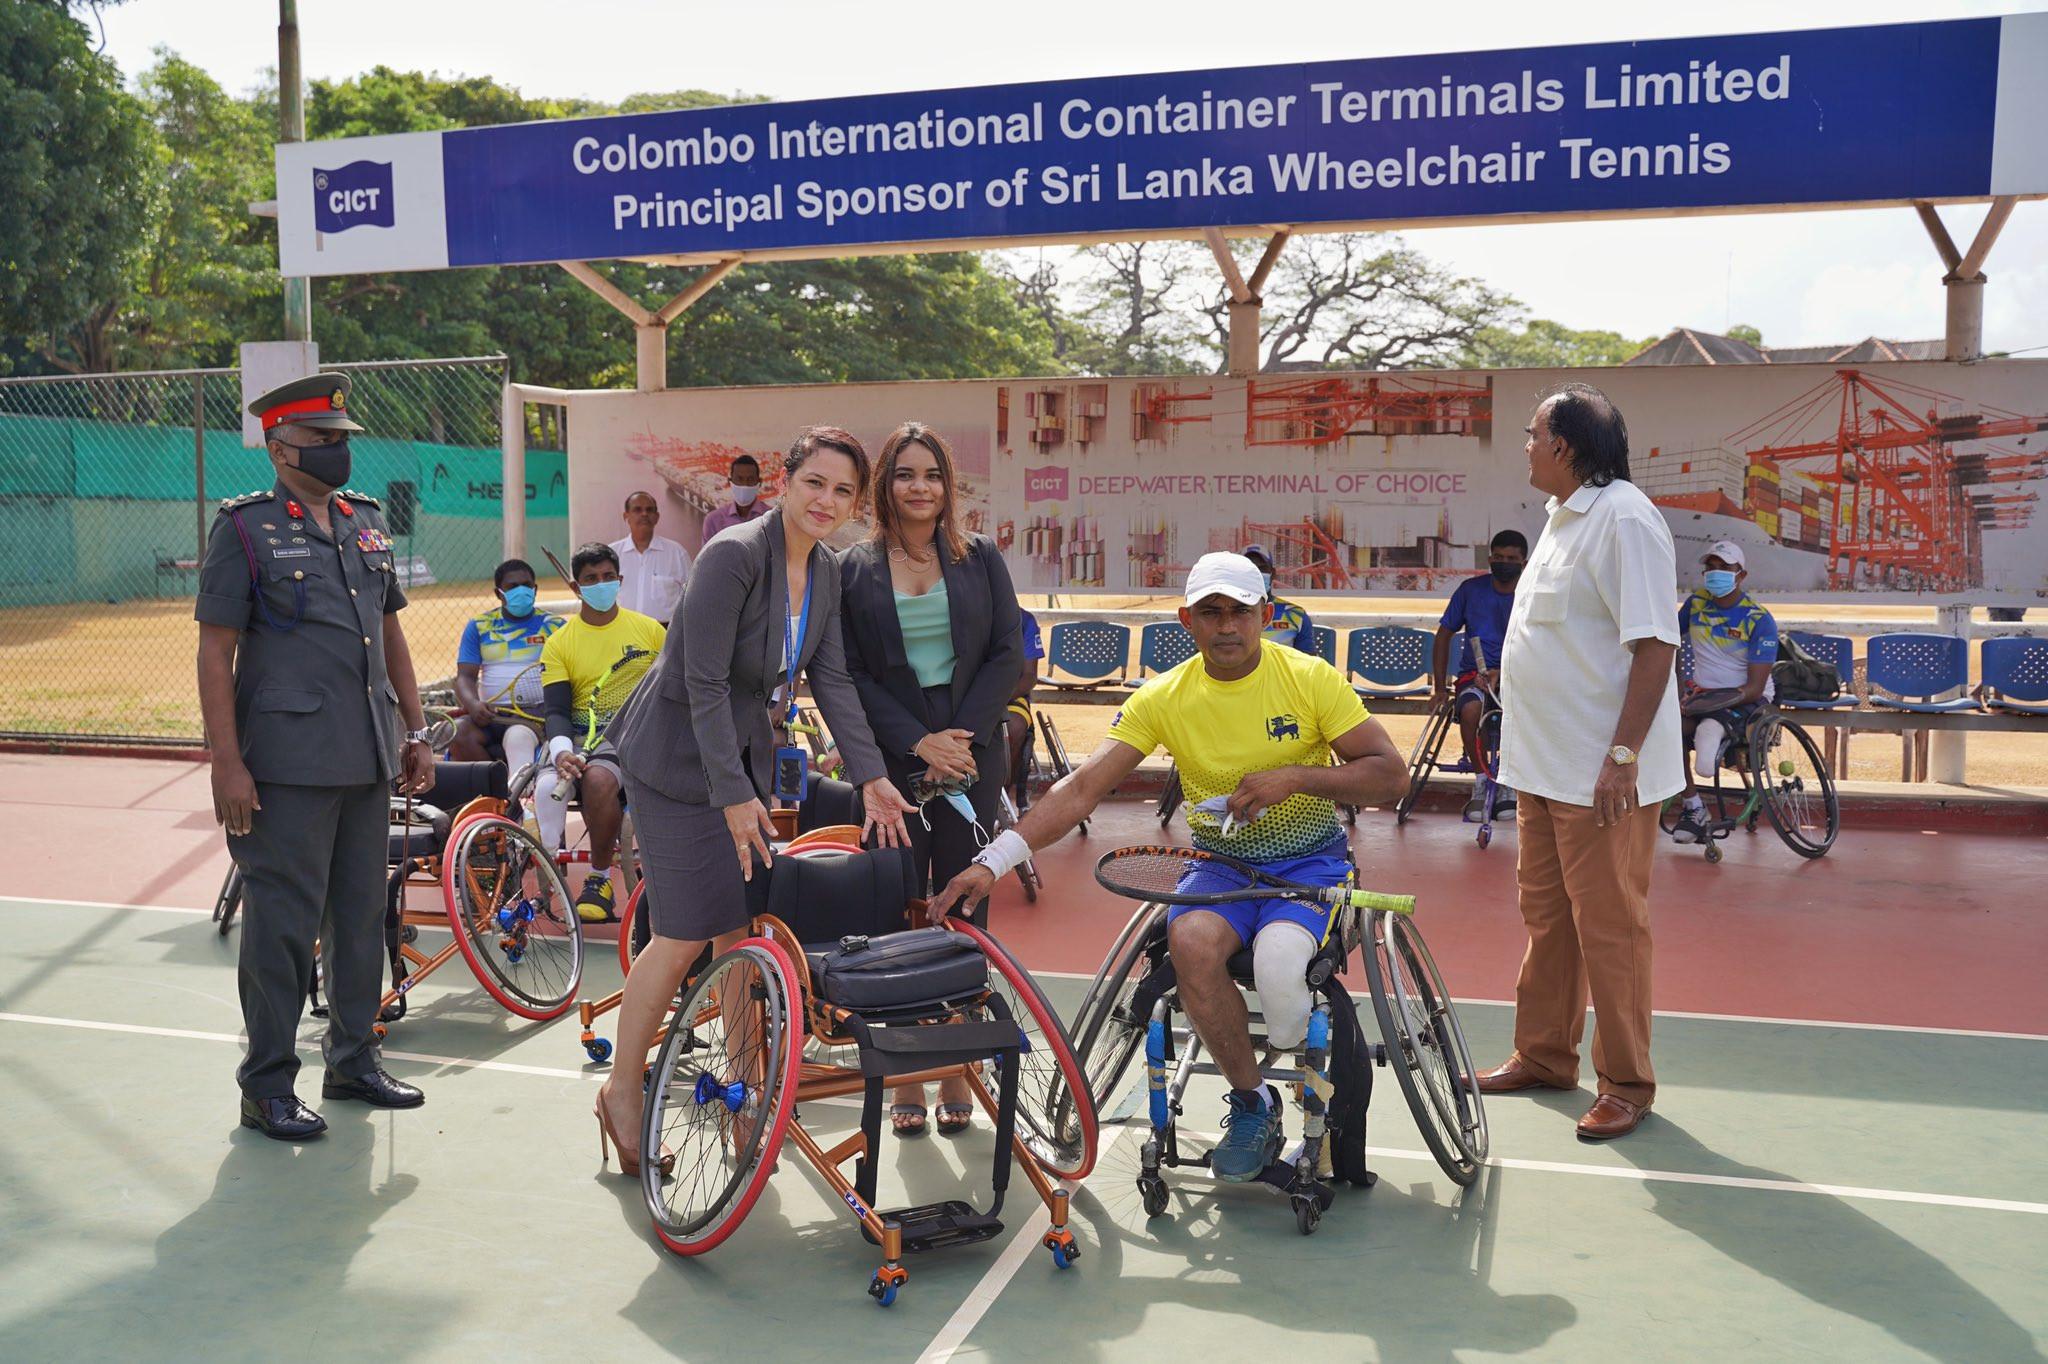 Shipping companies donate wheelchairs to Sri Lankan tennis players